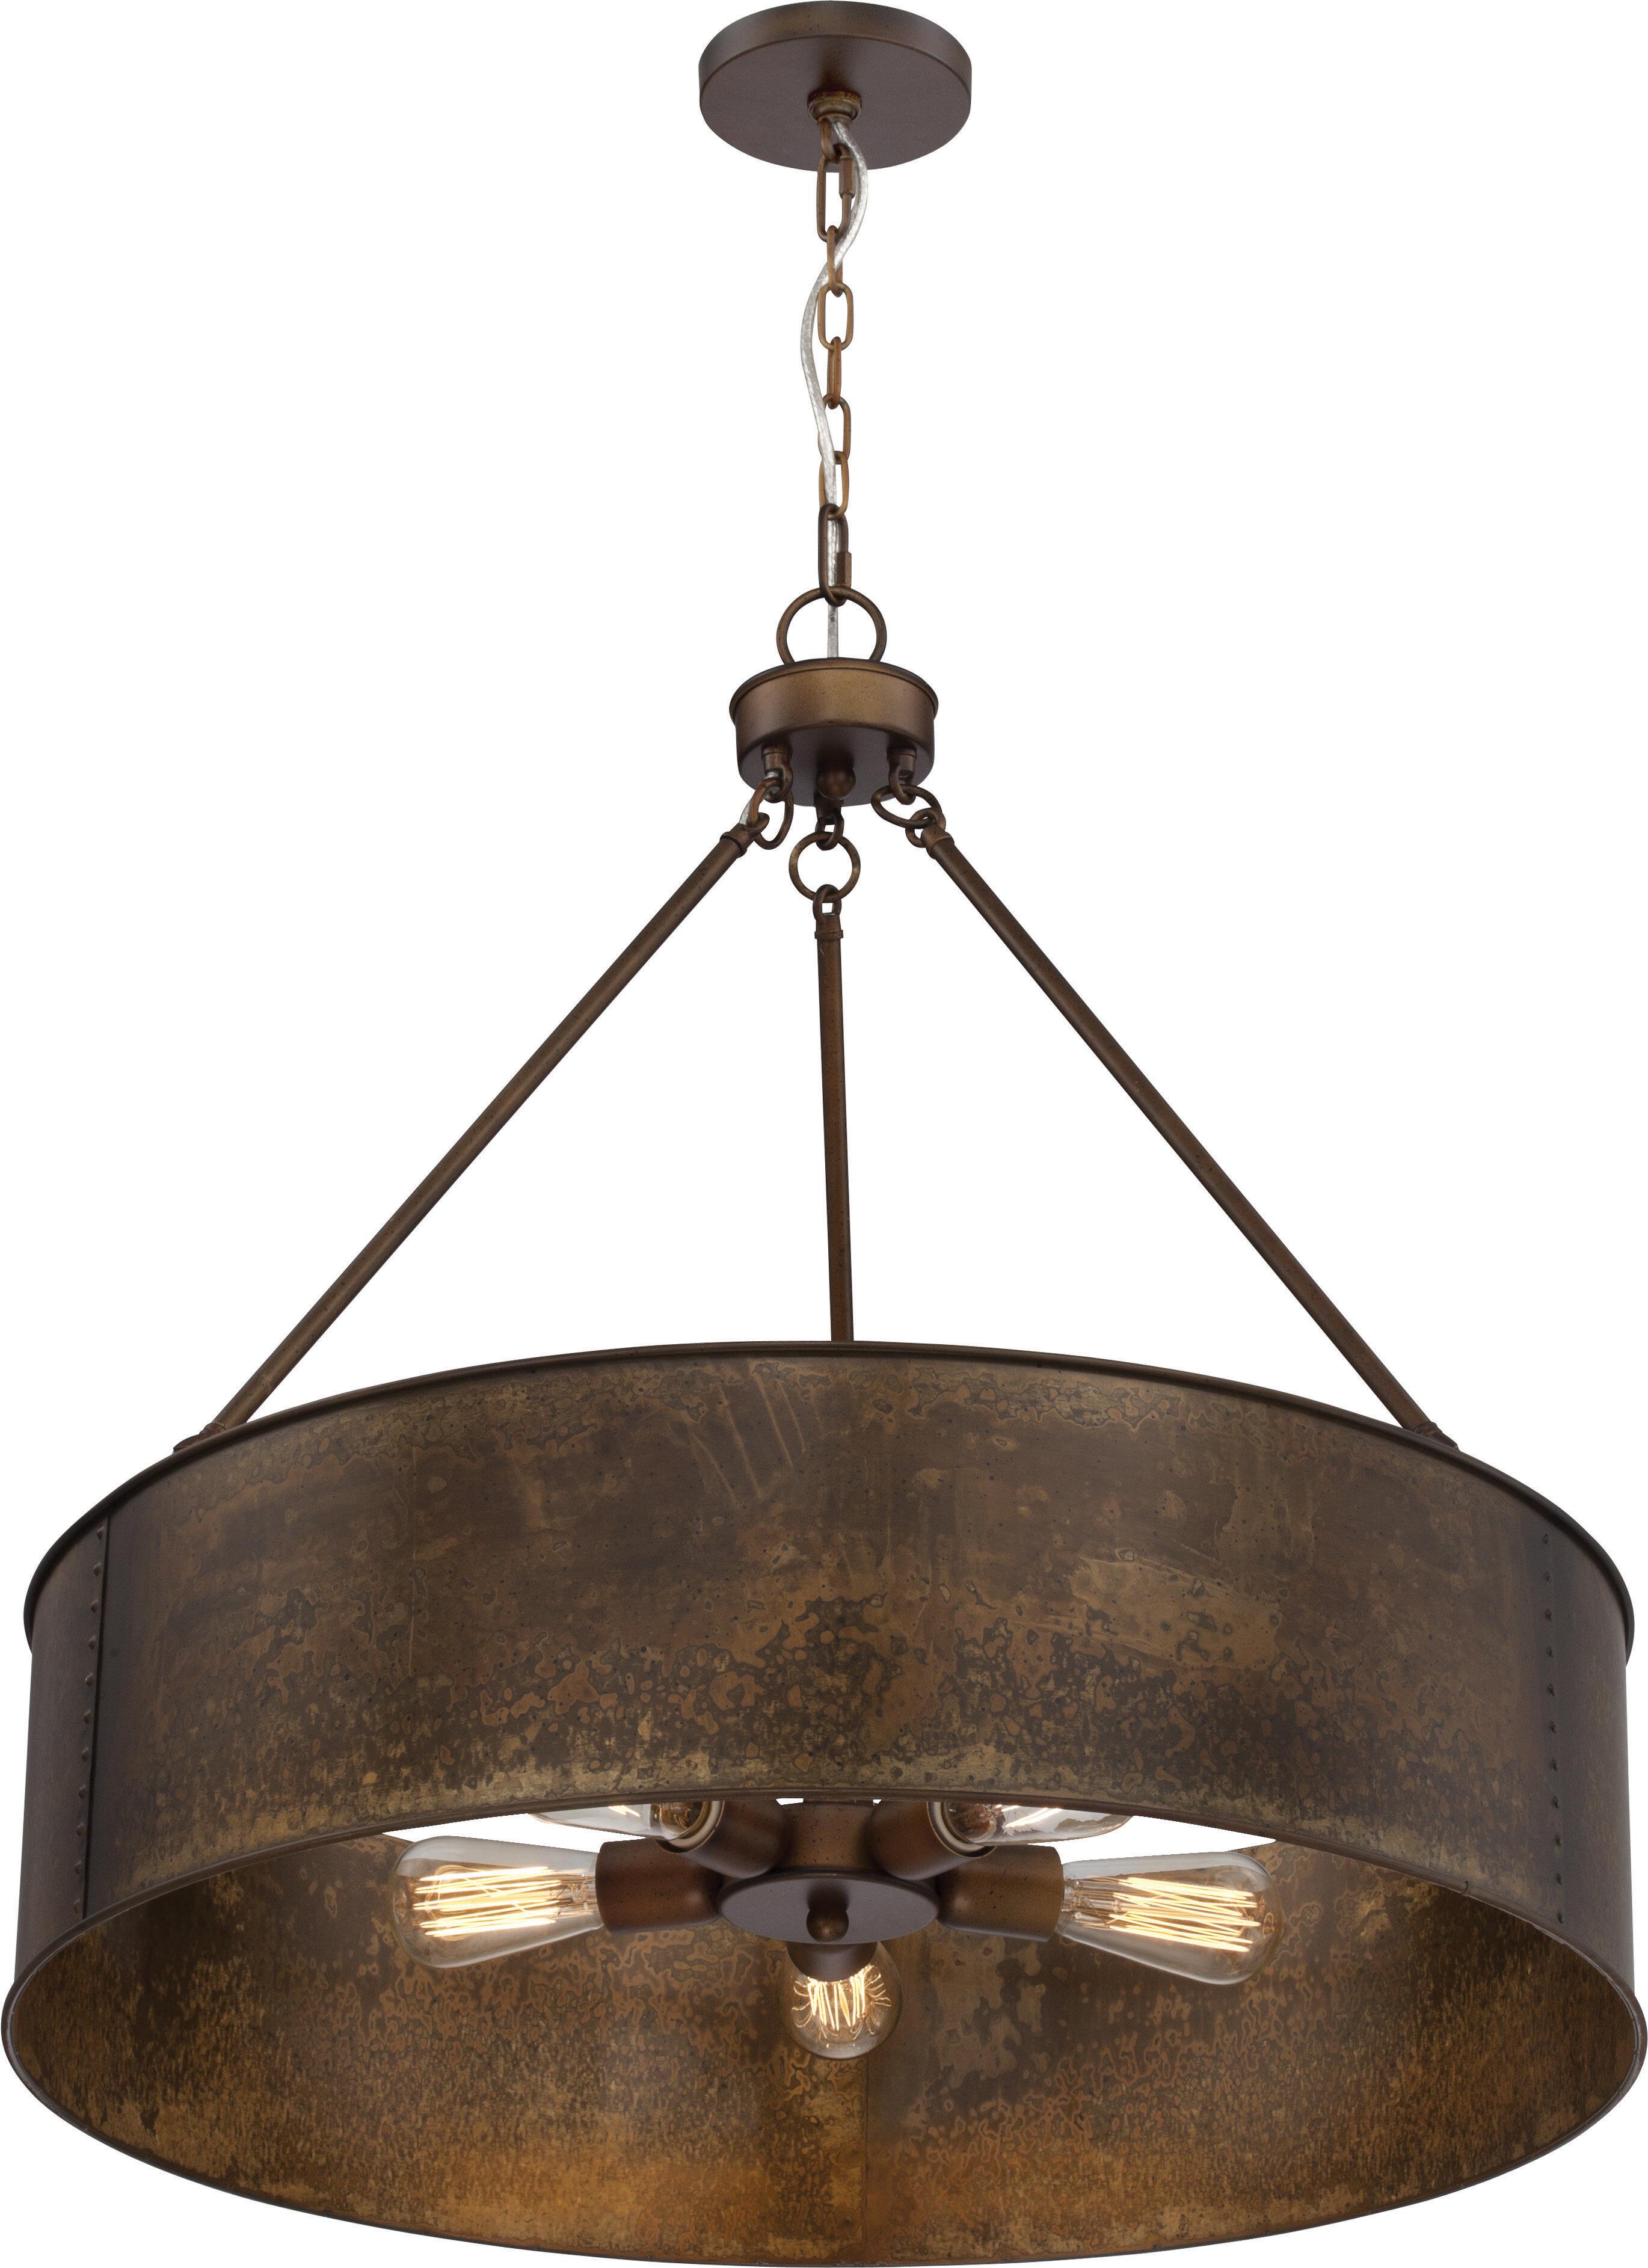 Farmhouse & Rustic Trent Austin Design Pendants | Birch Lane Regarding Irwin 1 Light Single Globe Pendants (View 10 of 30)